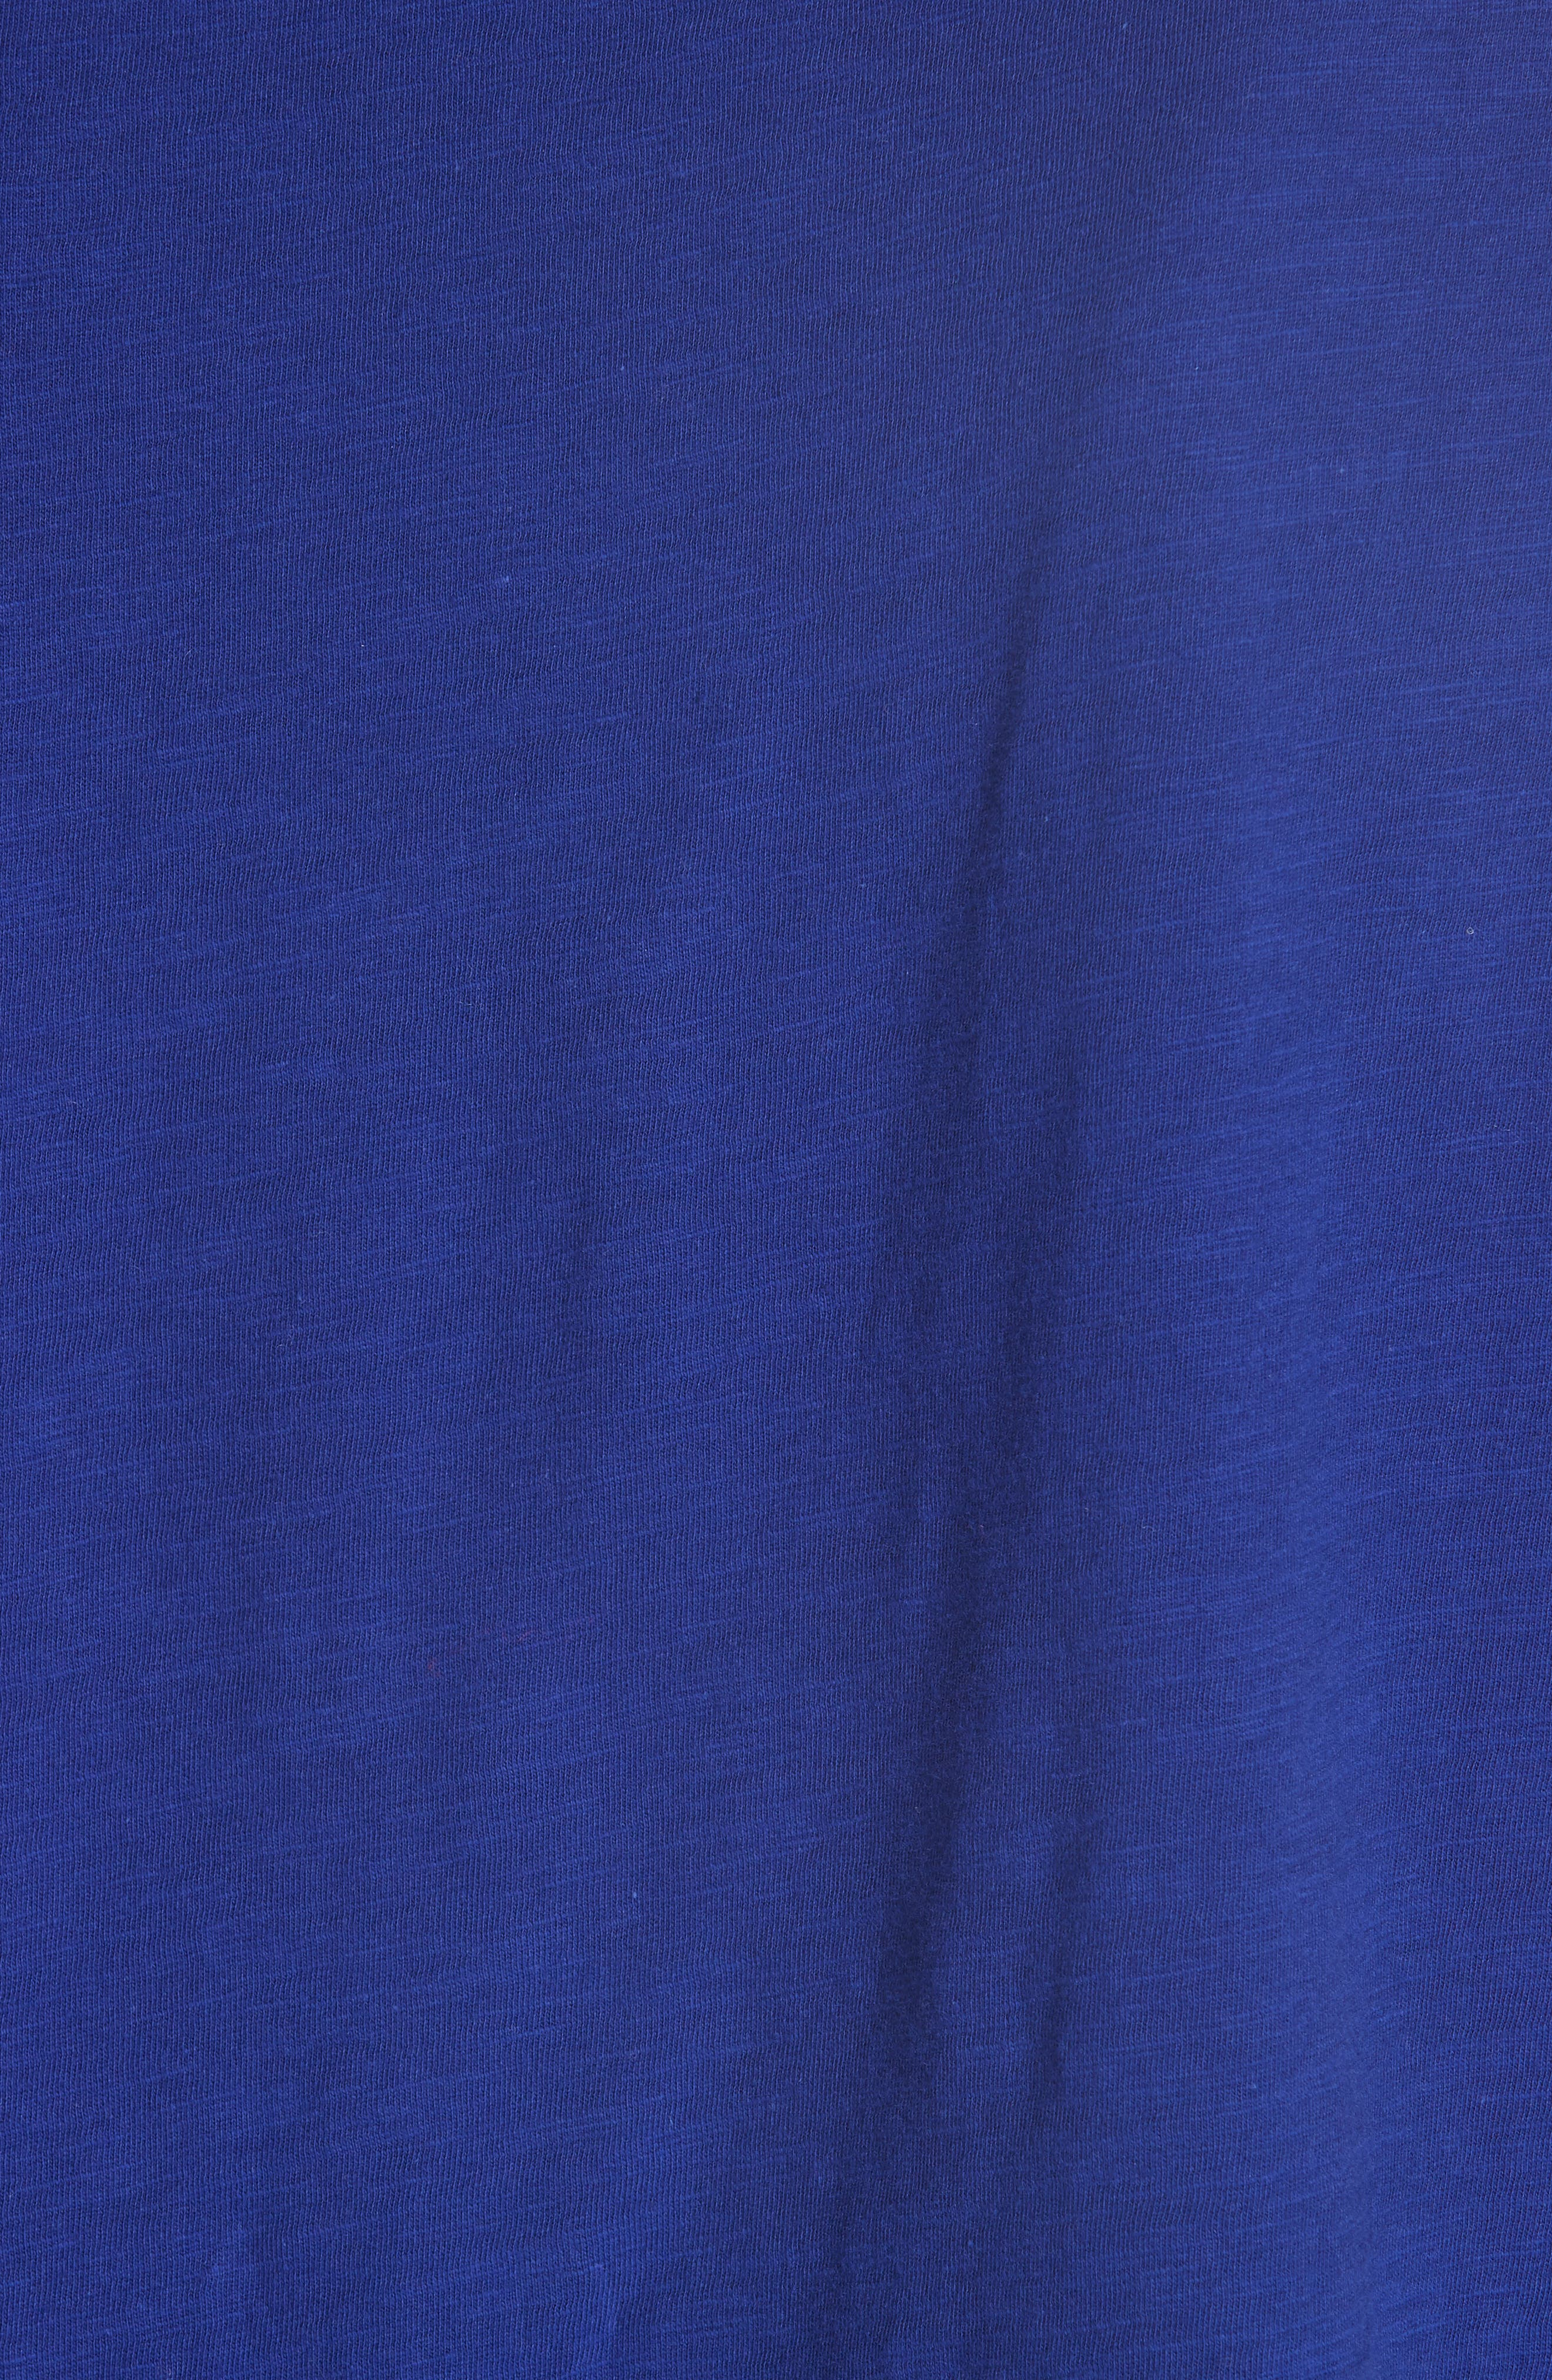 Short Organic Cotton Shell,                             Alternate thumbnail 5, color,                             BLUE VIOLET